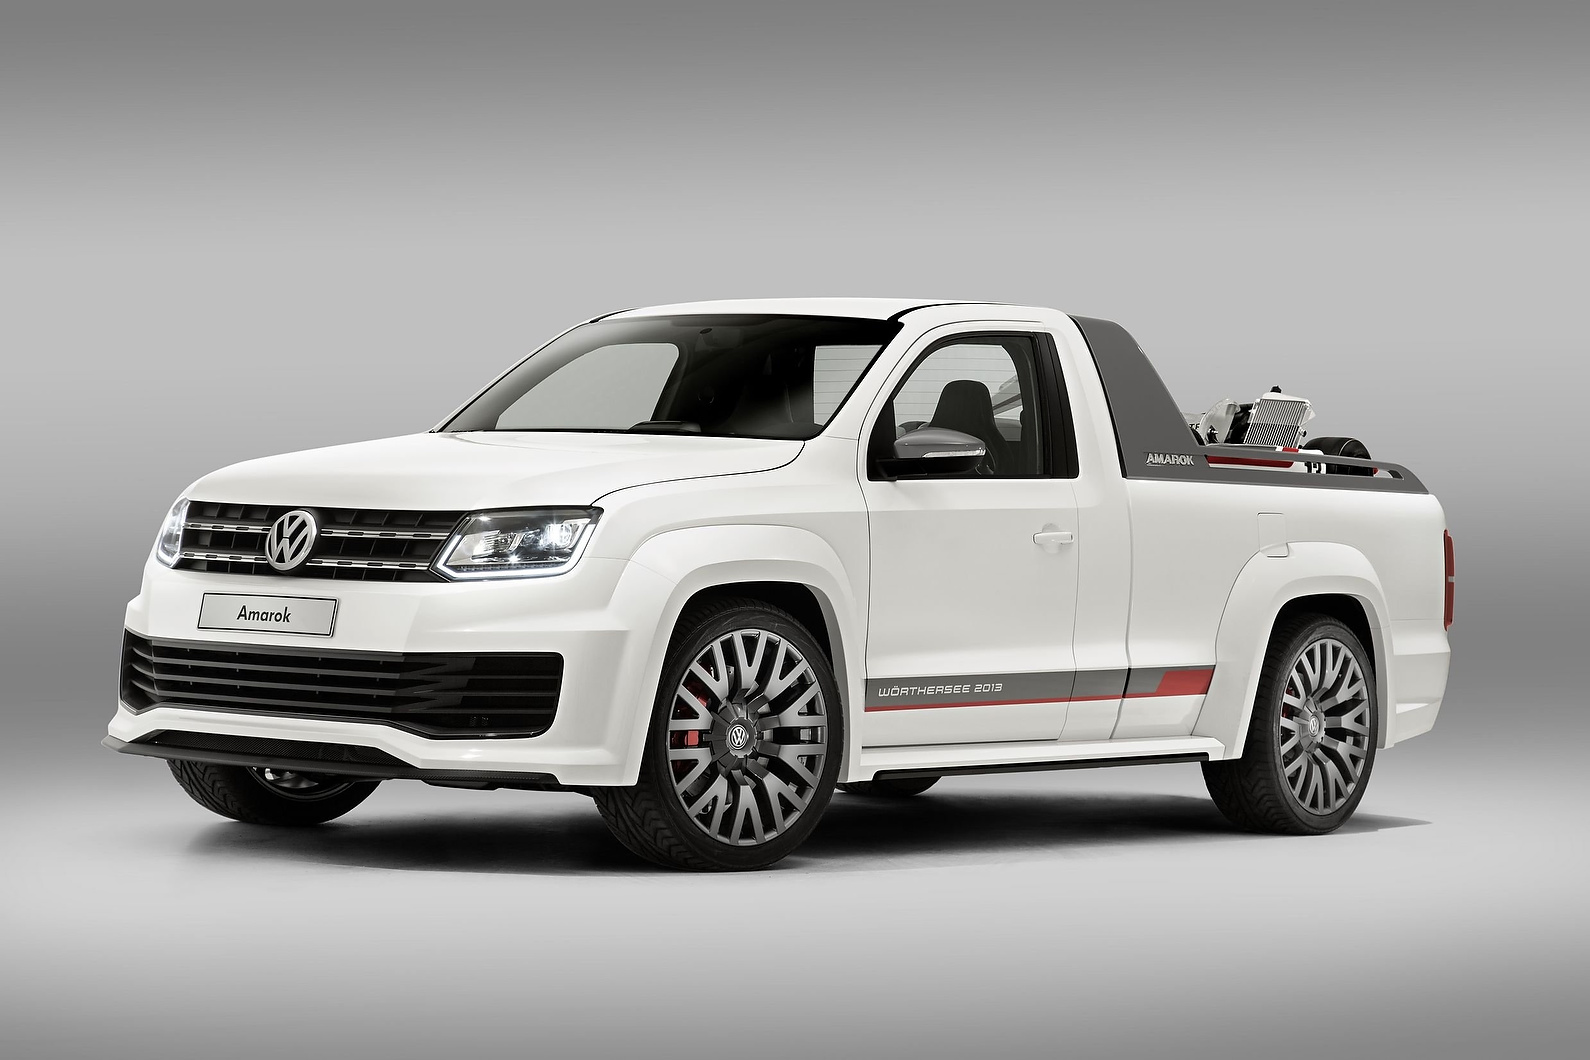 Прототип нового пикапа Volkswagen Amarok